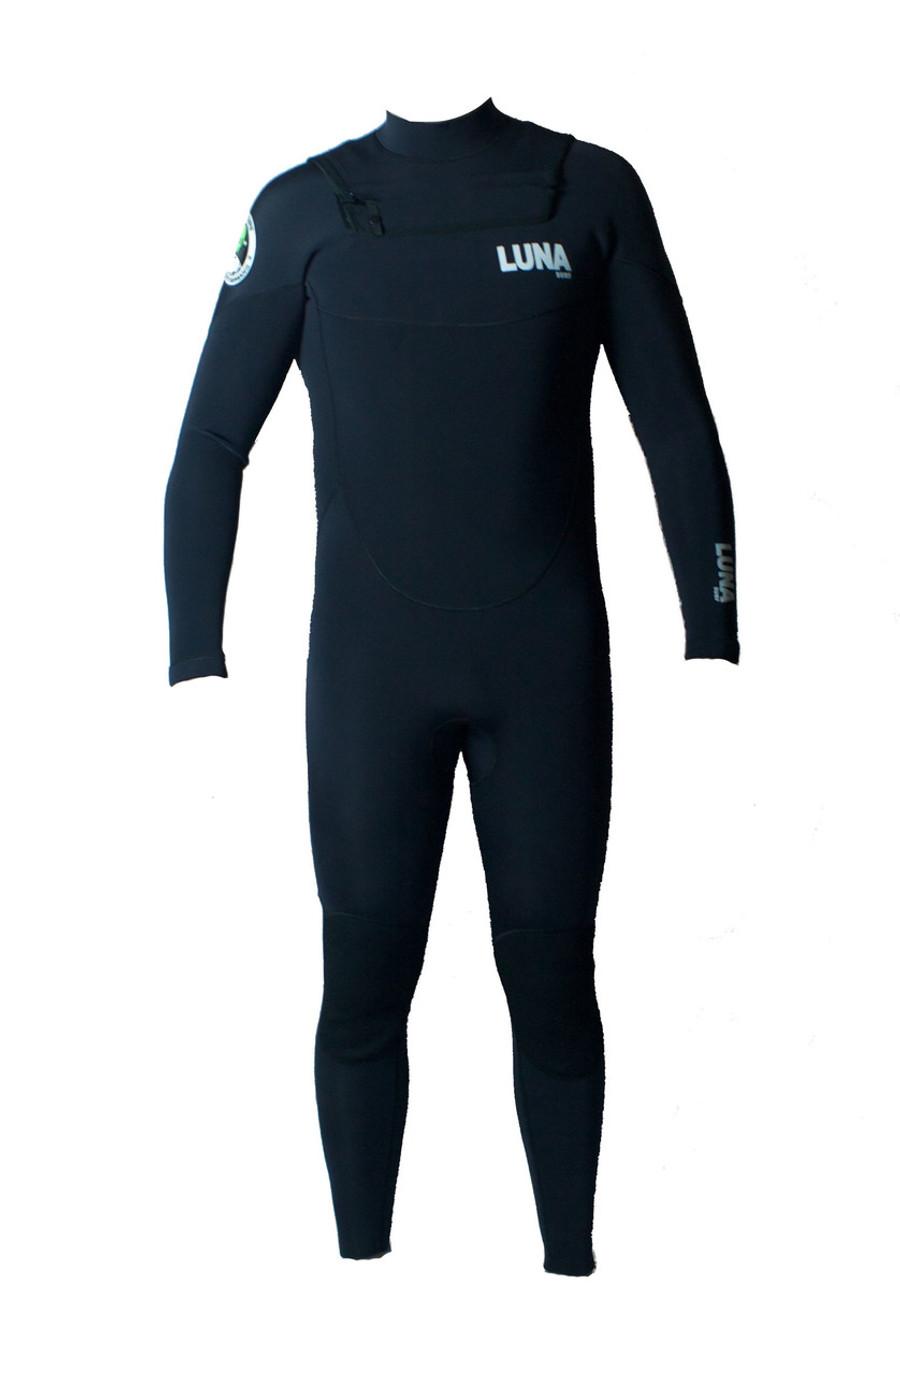 Lunasurf Arcane 4.3mm wetsuit